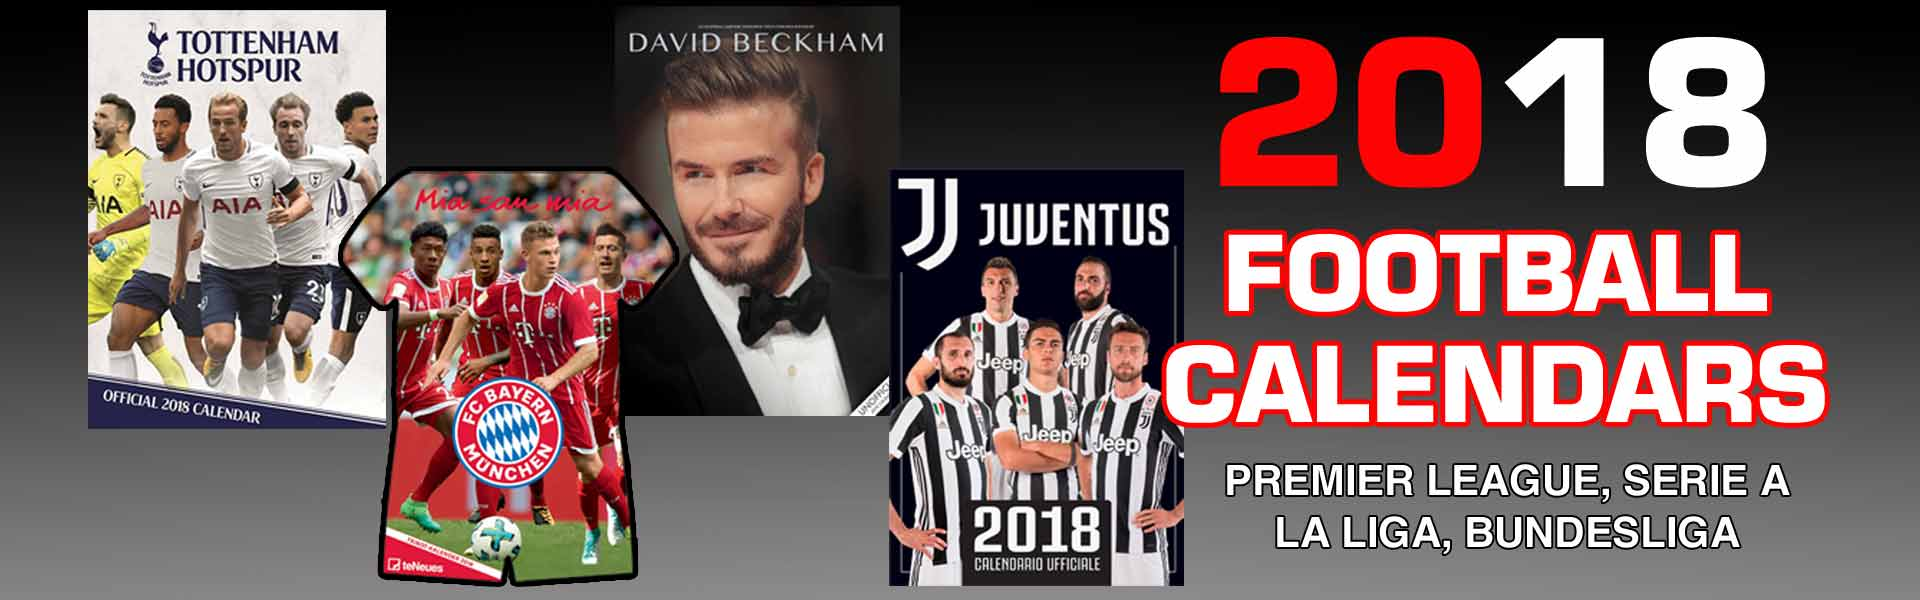 2018 football calendars image